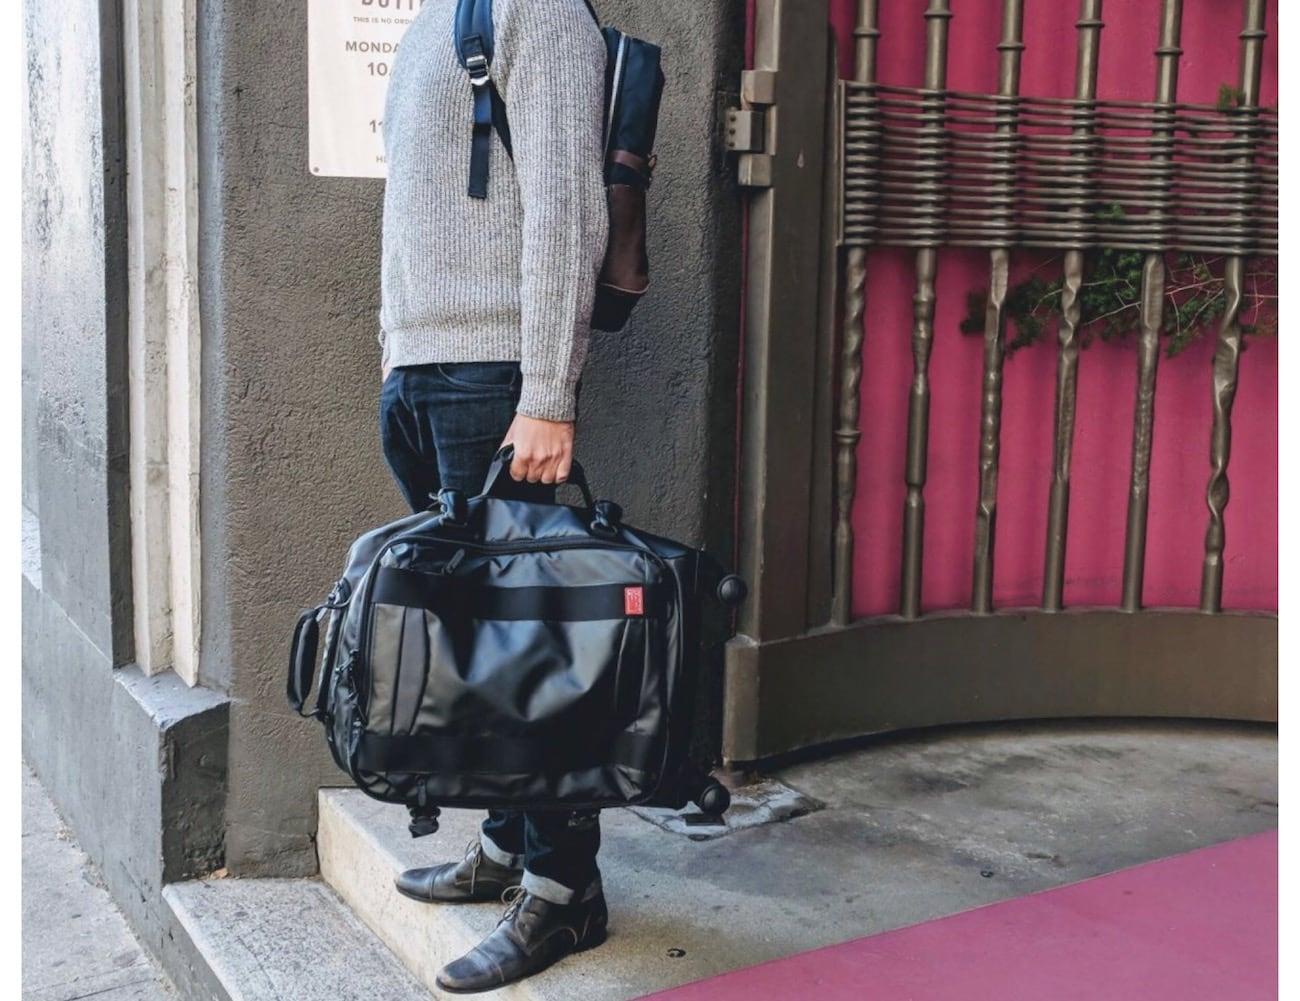 Hideo Wakamatsu Veil Carry-On Luggage